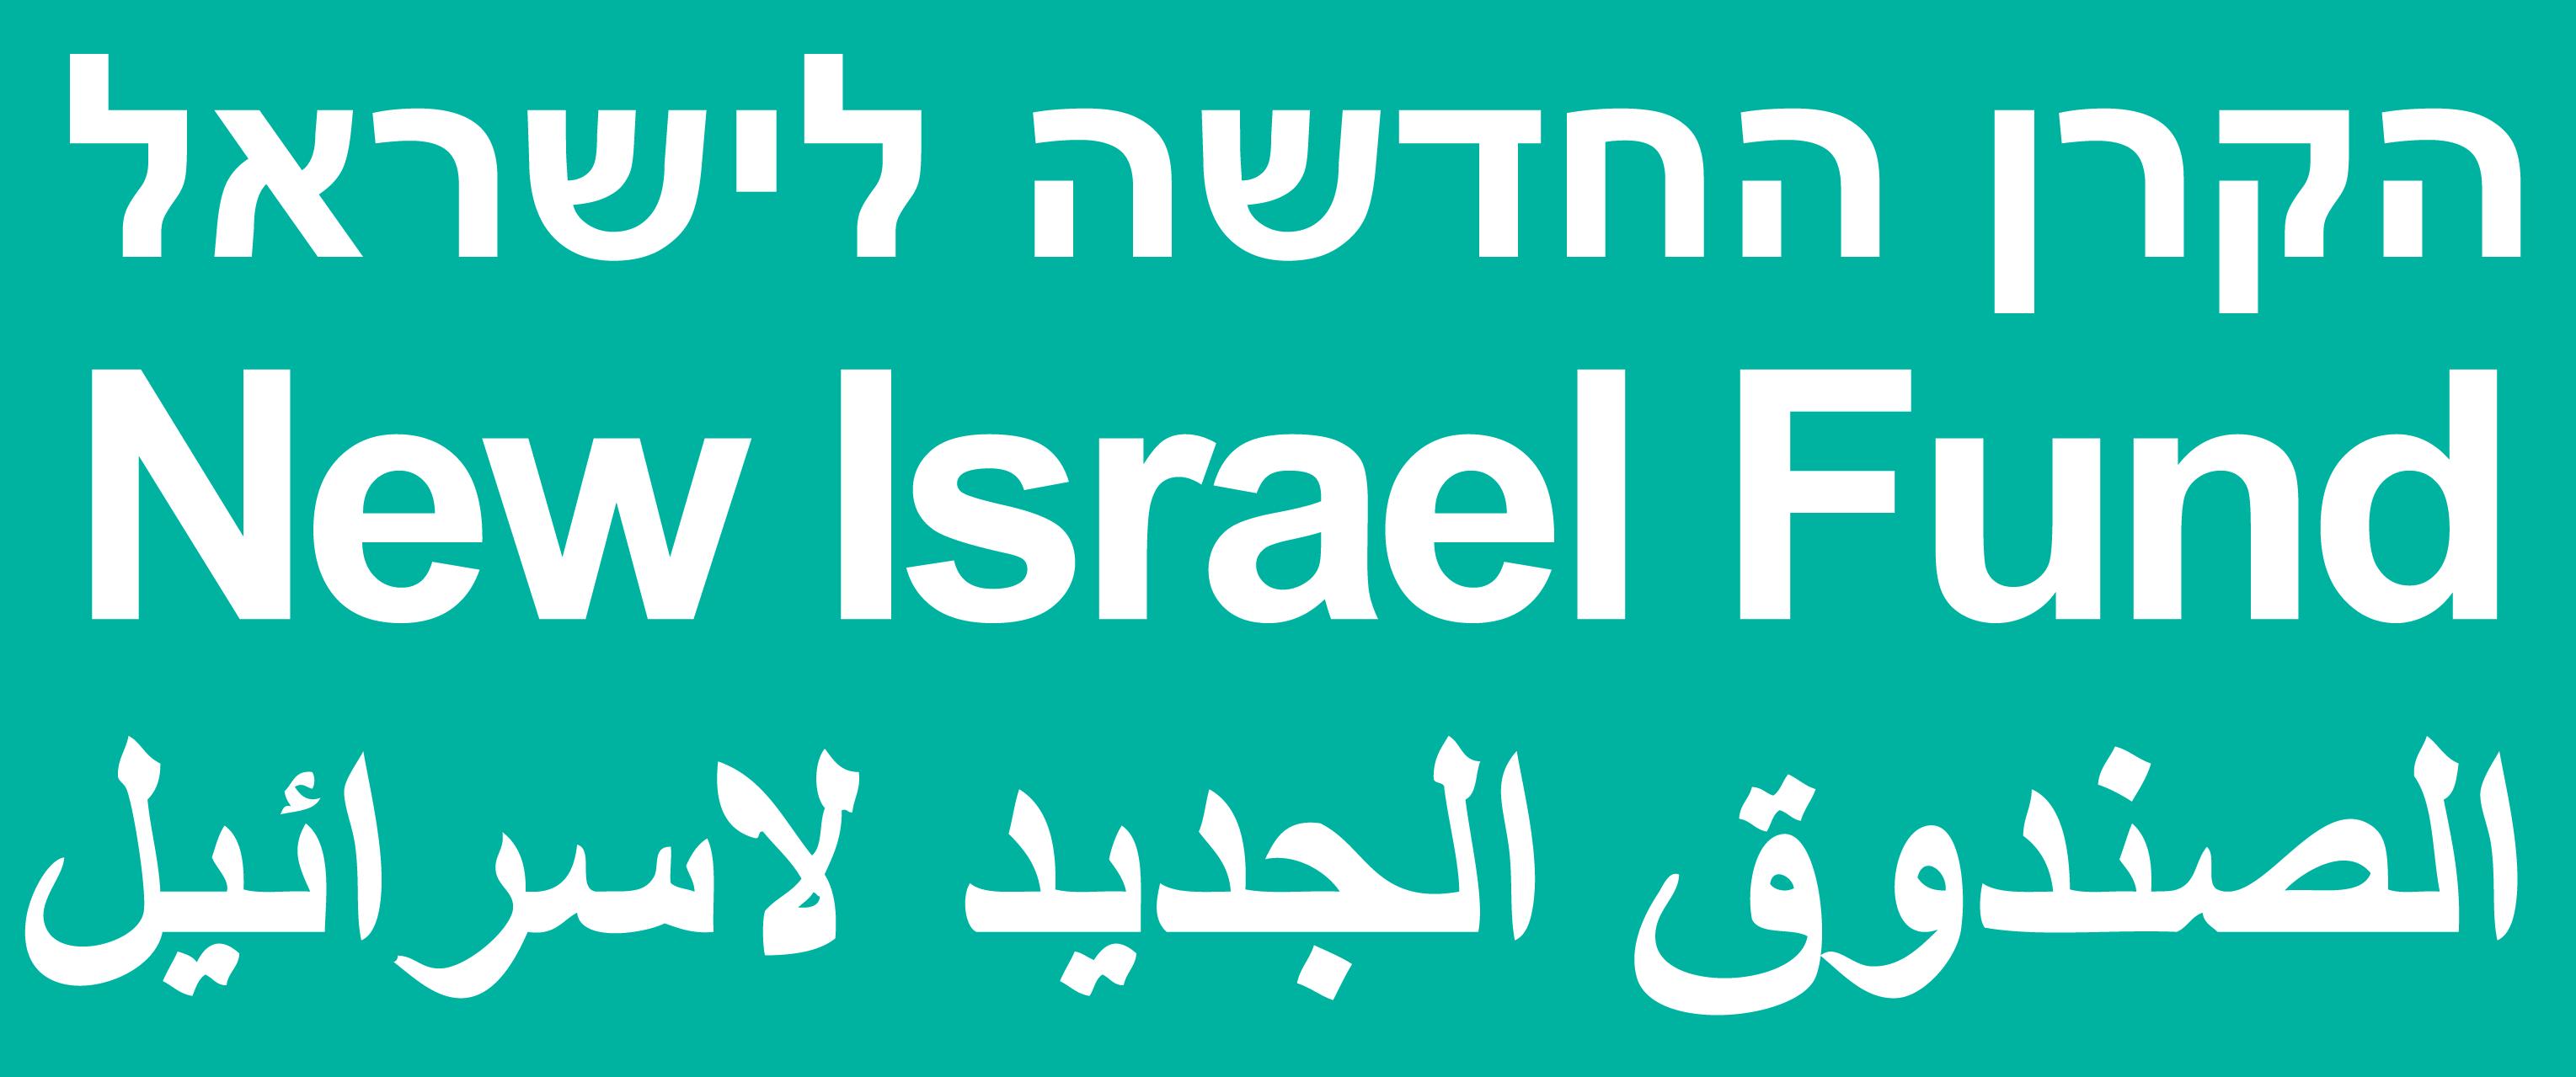 New Israel Fund